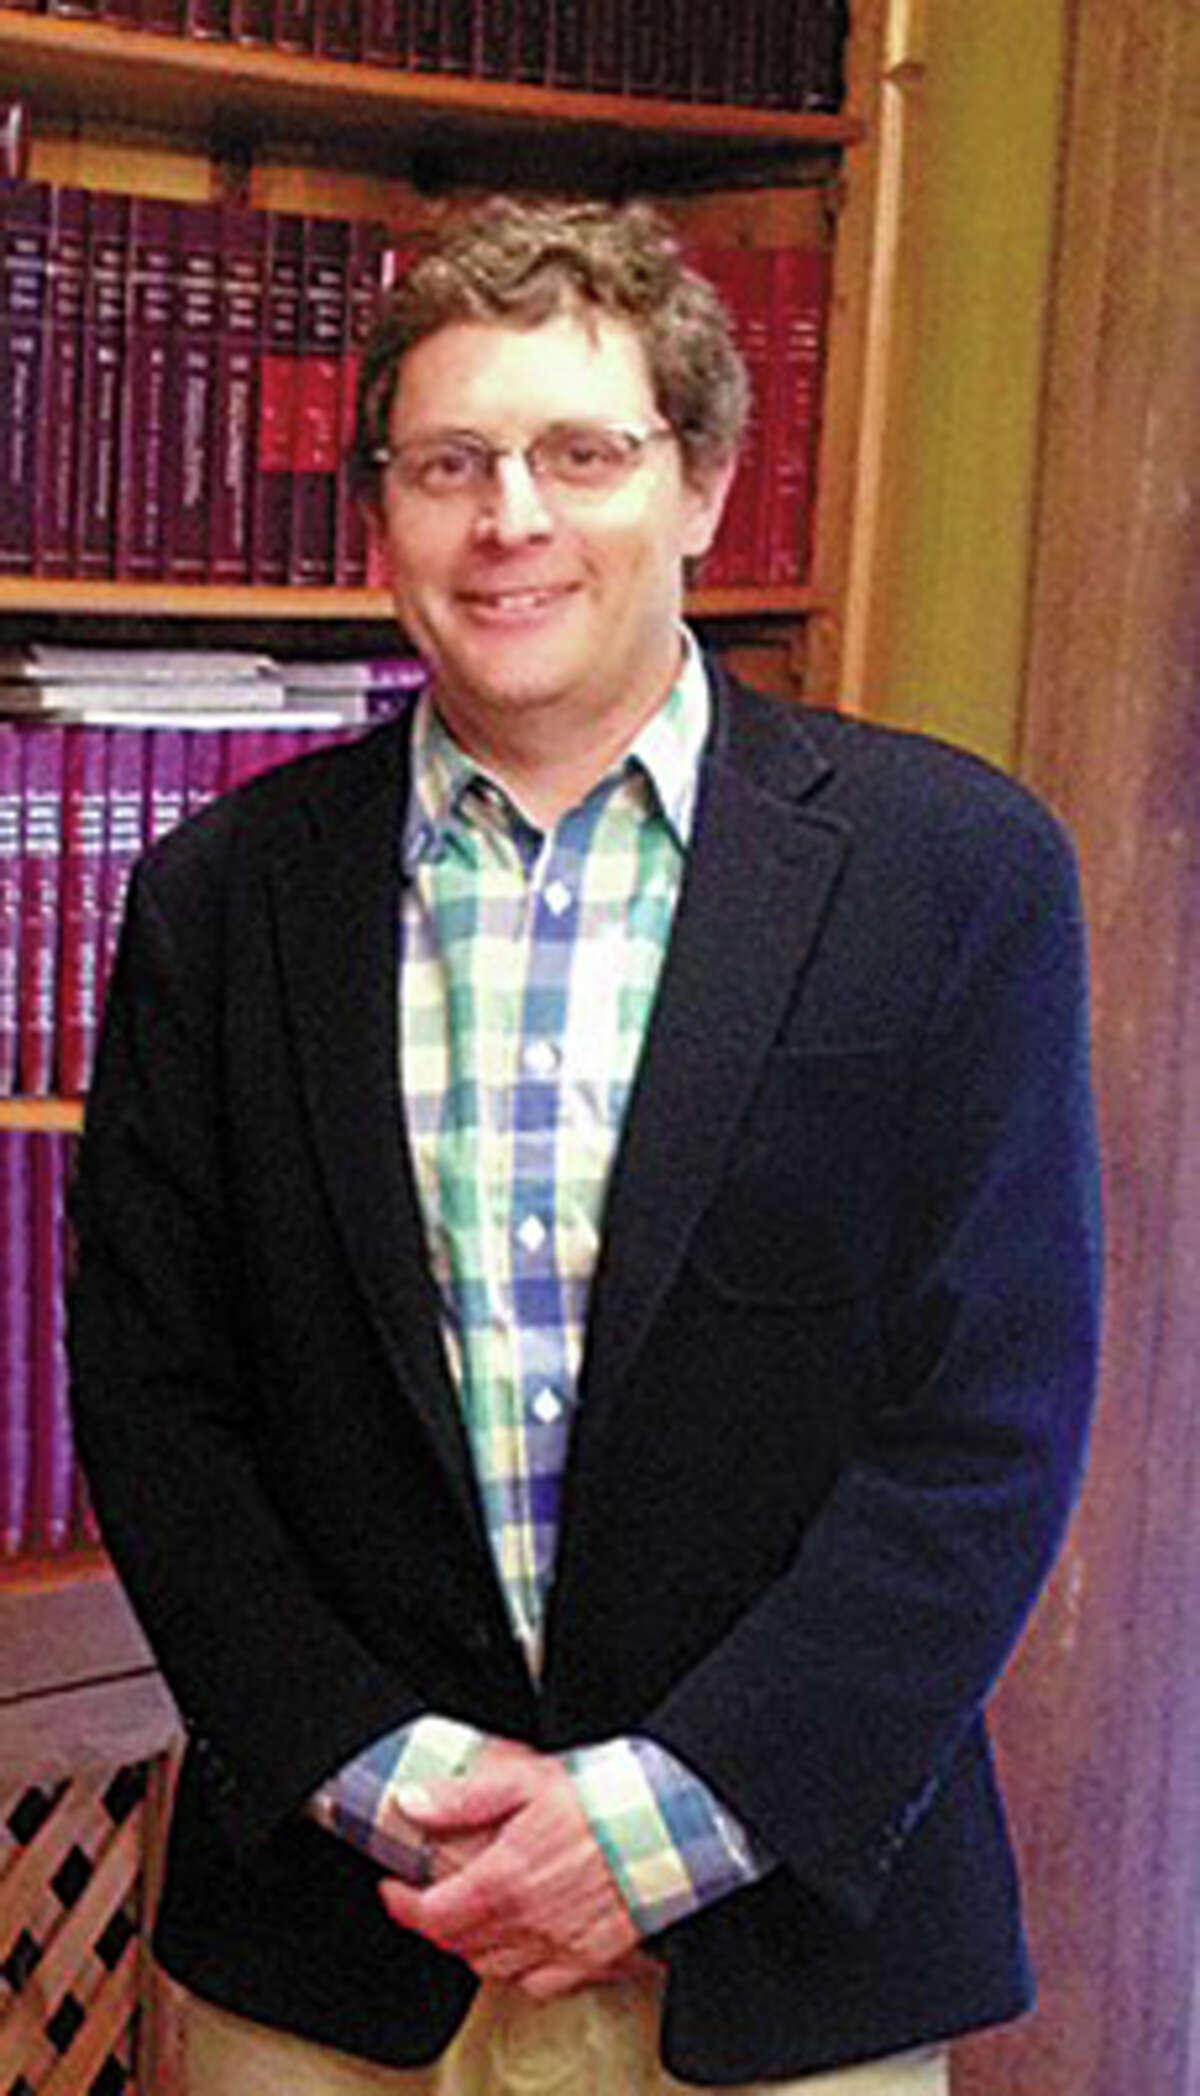 David Rucci